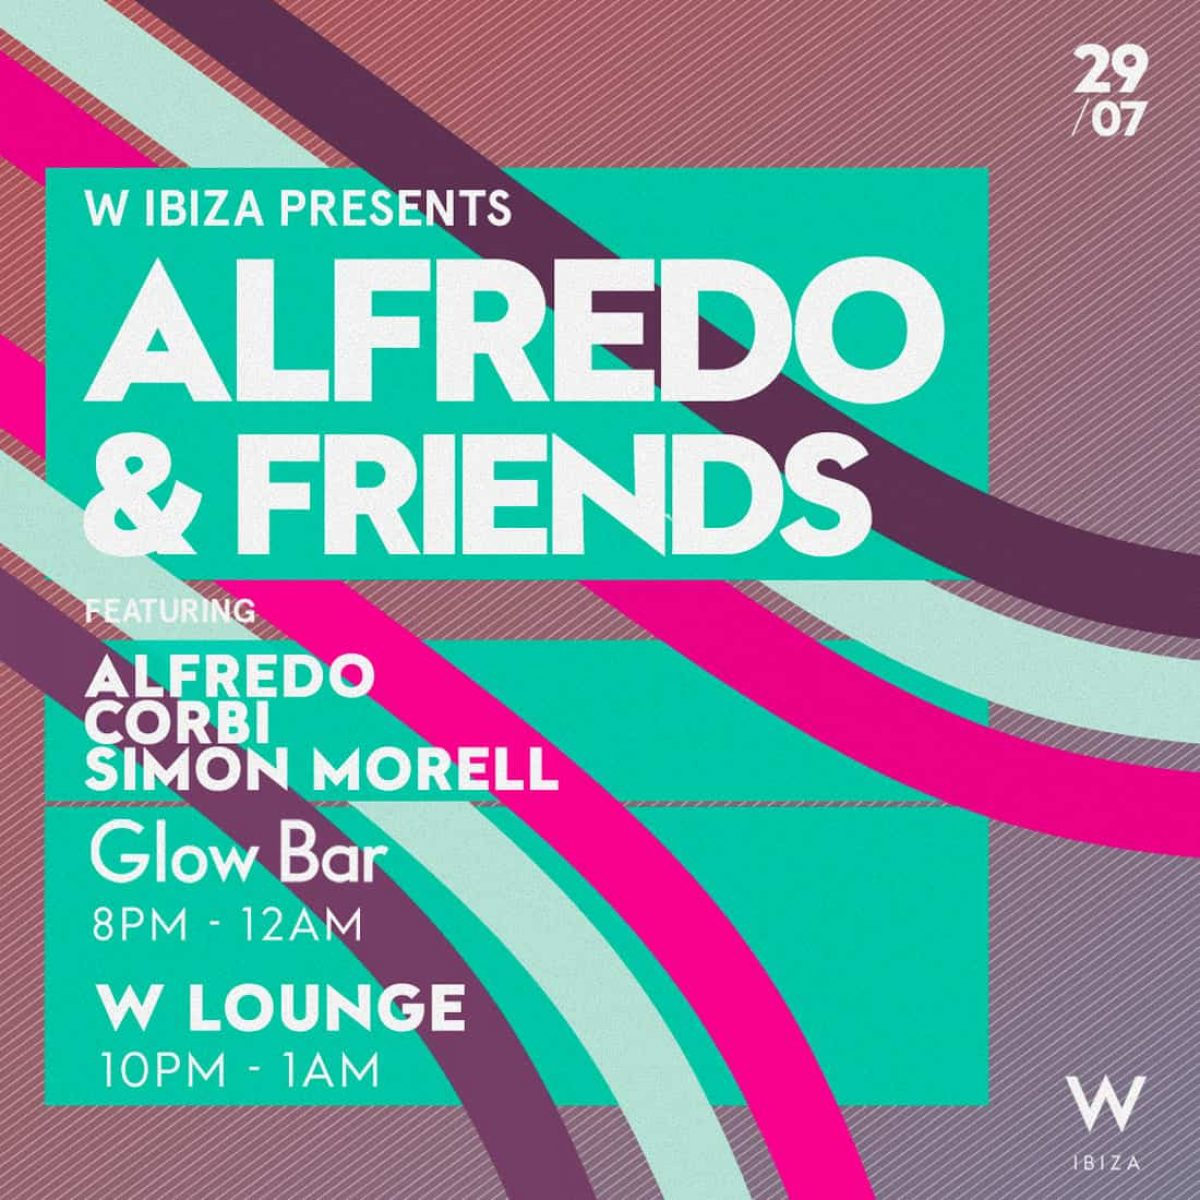 alfredo-and-friends-w-ibiza-hotel-2021-welcometoibiza